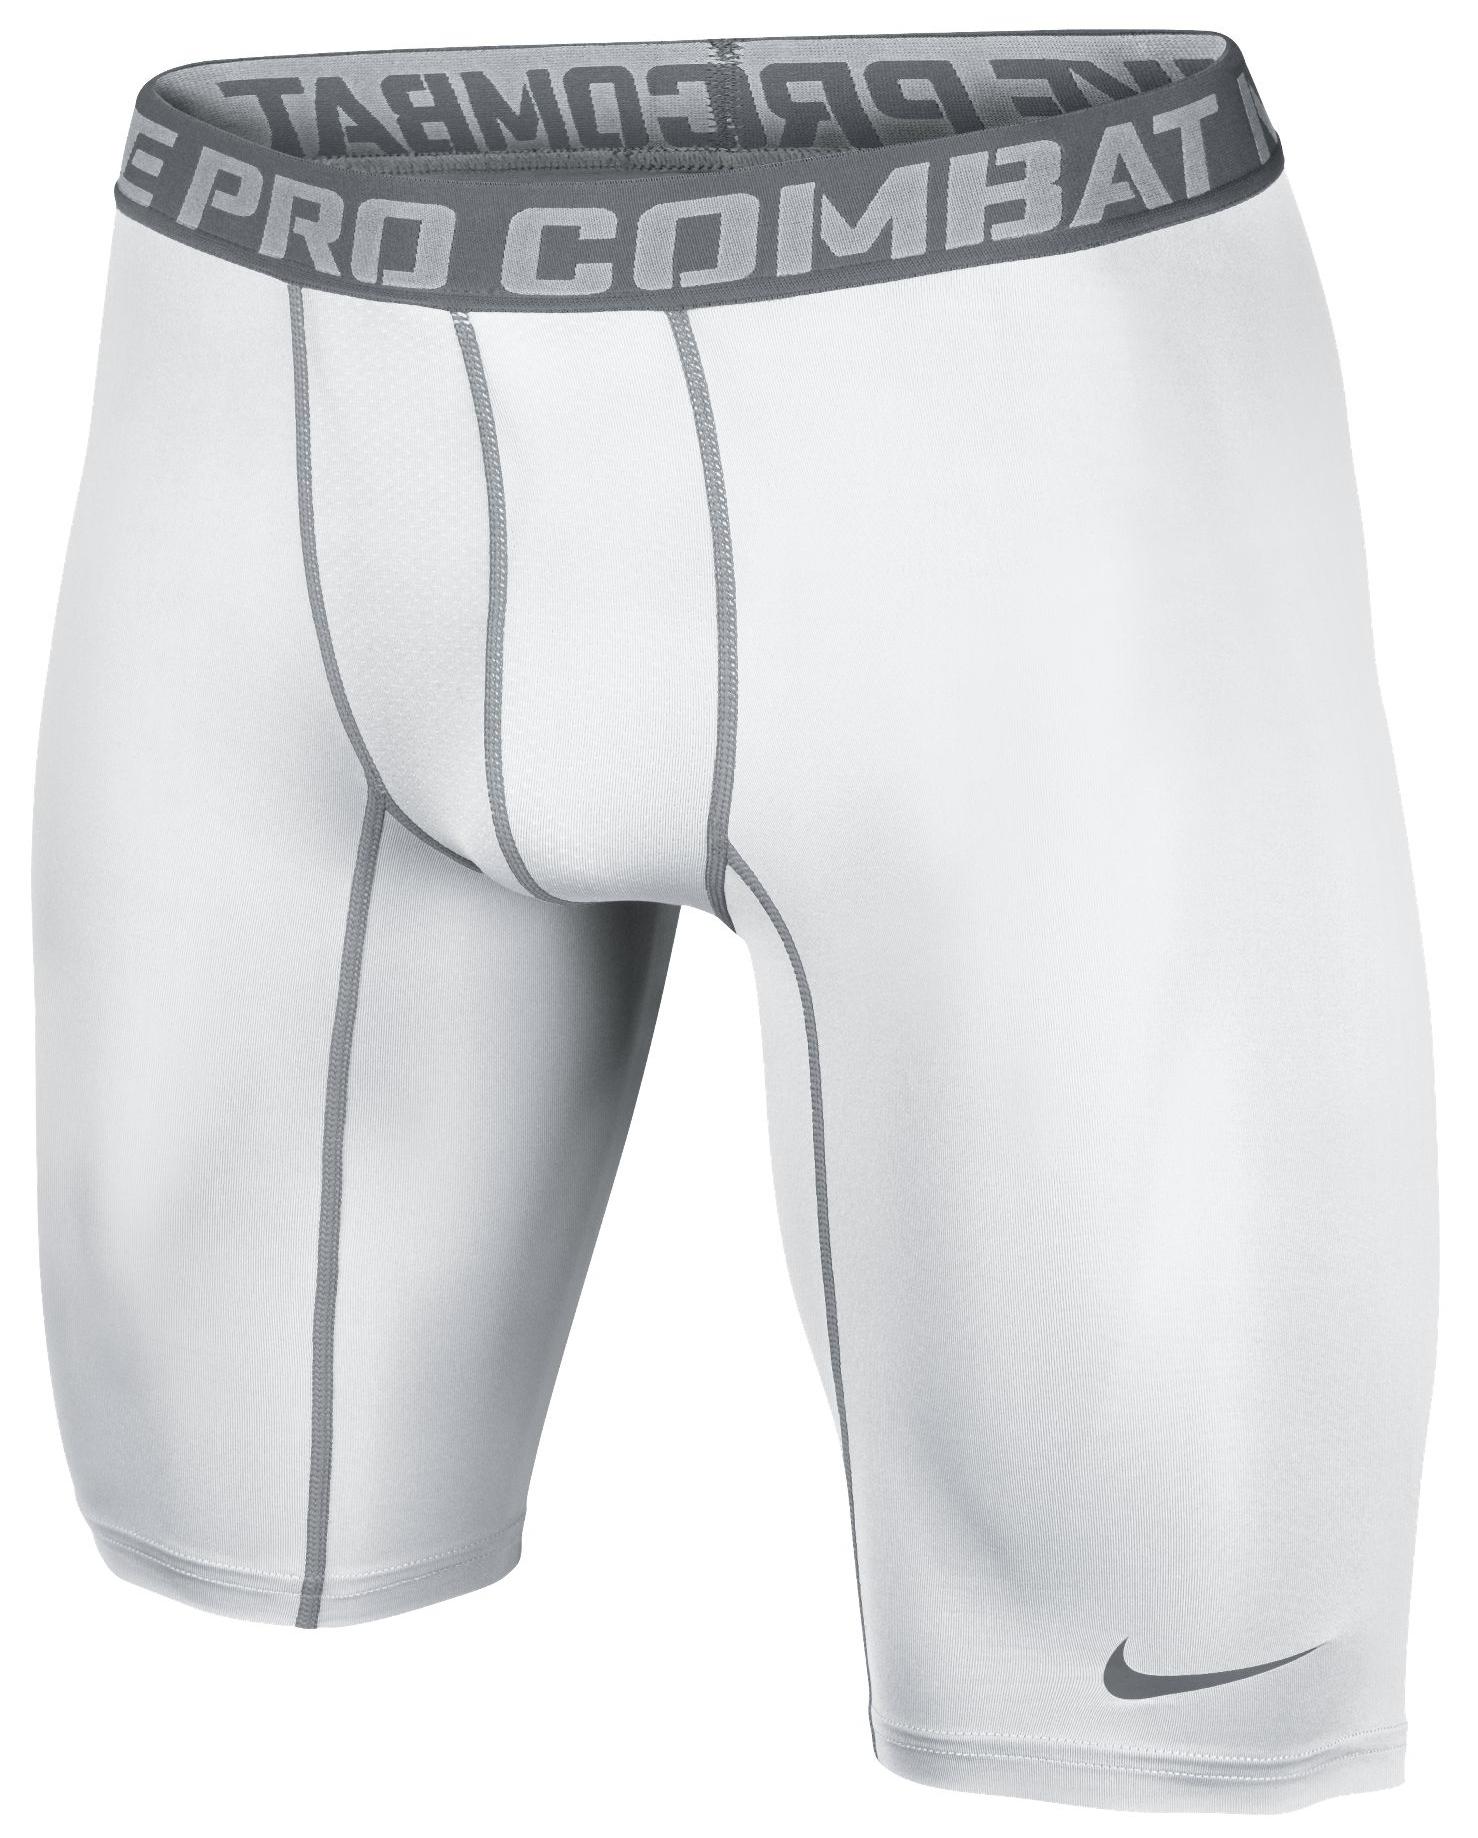 Nike Pro Combat Core Compression 2.0 Shorts 9' Vit/Grå